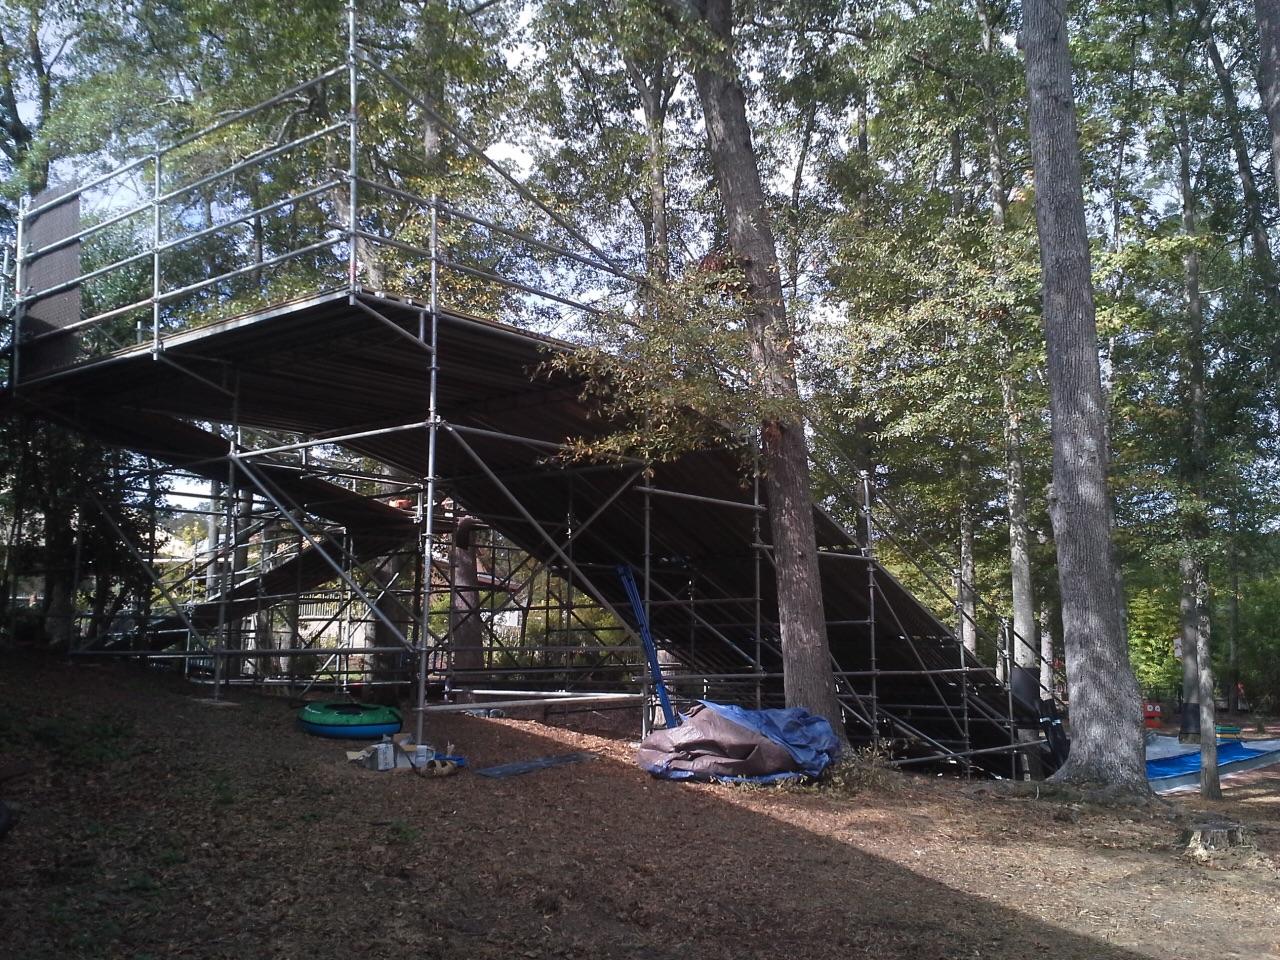 Birmingham Zoo scaffold playslide